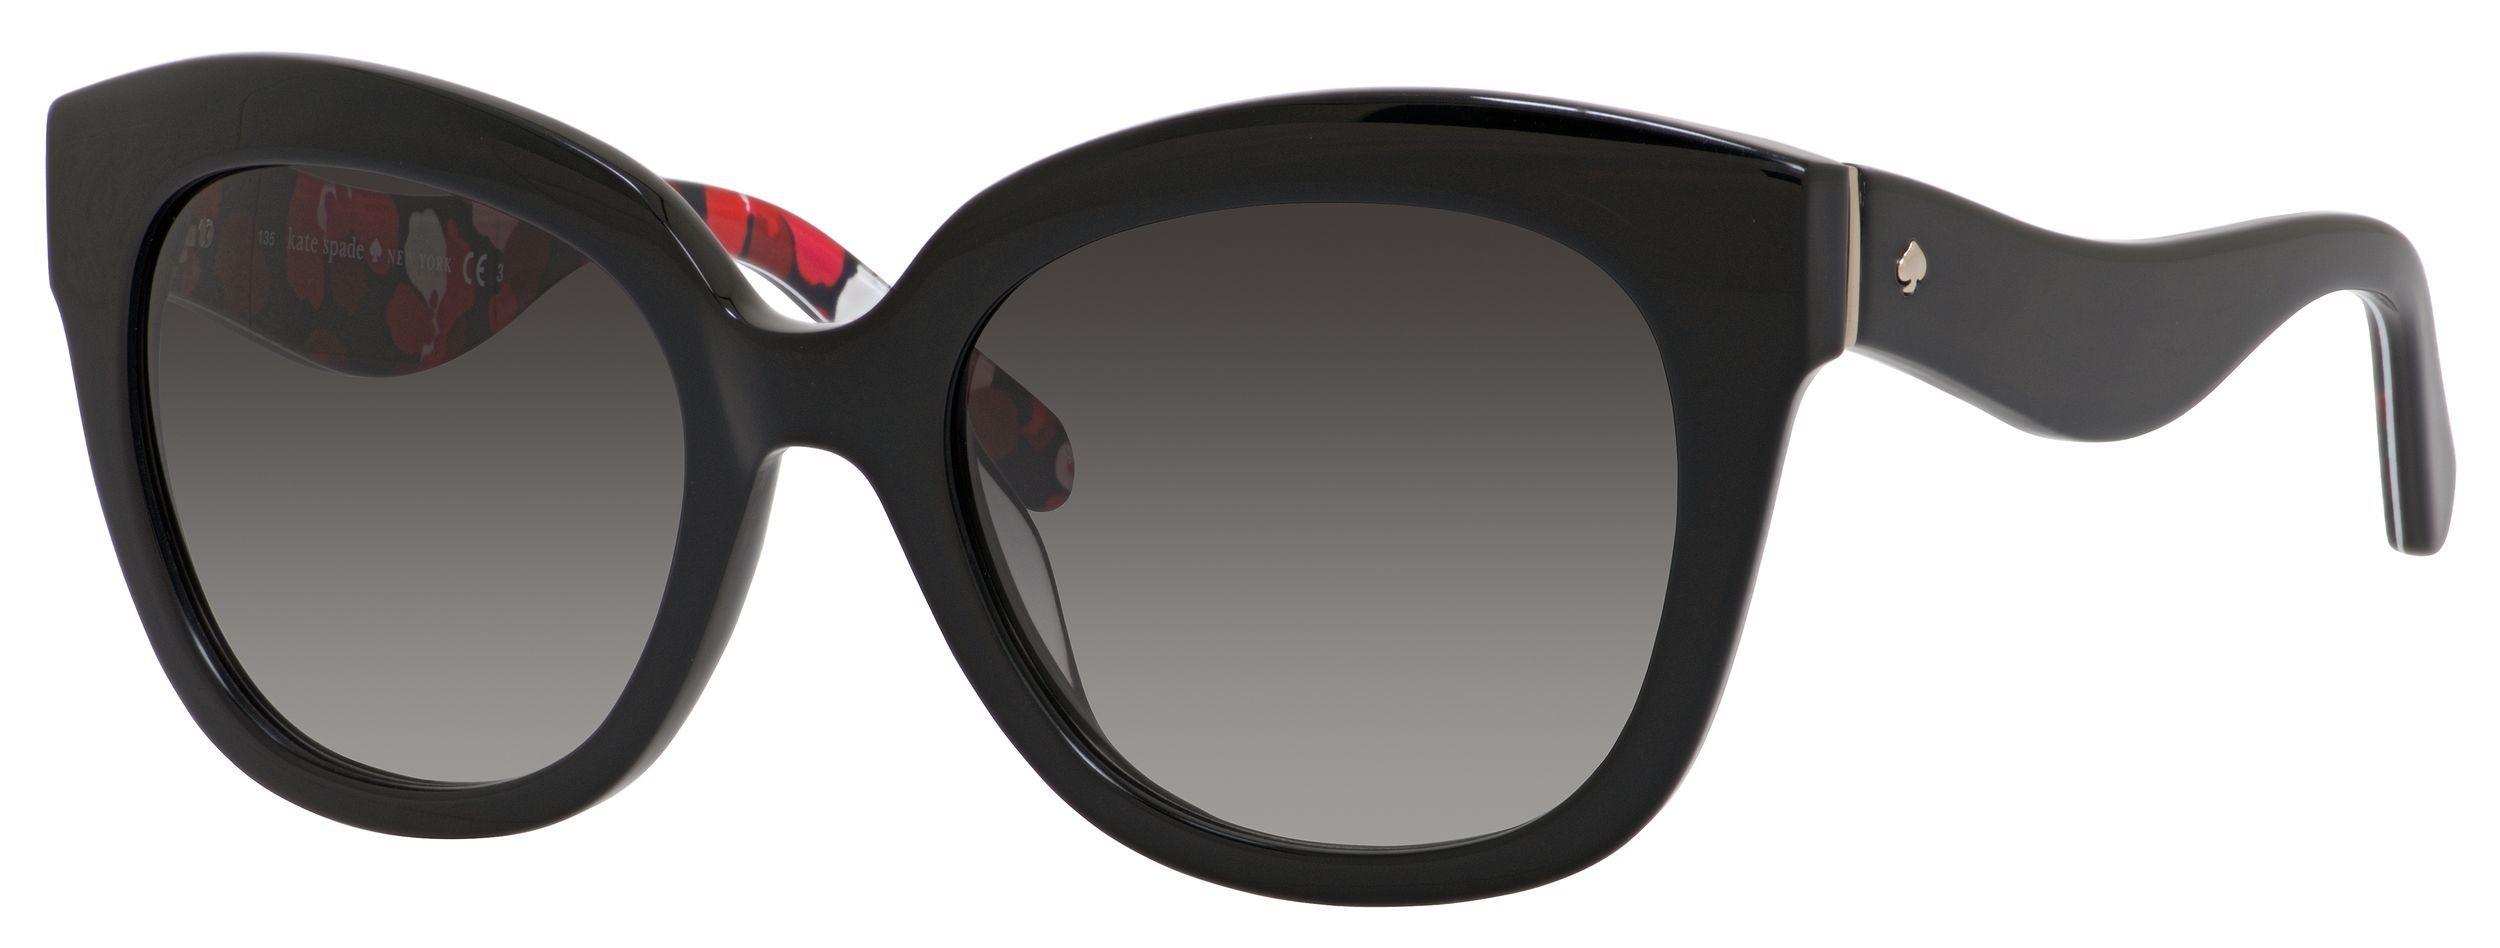 buy designer eyeglasses in milton ontario